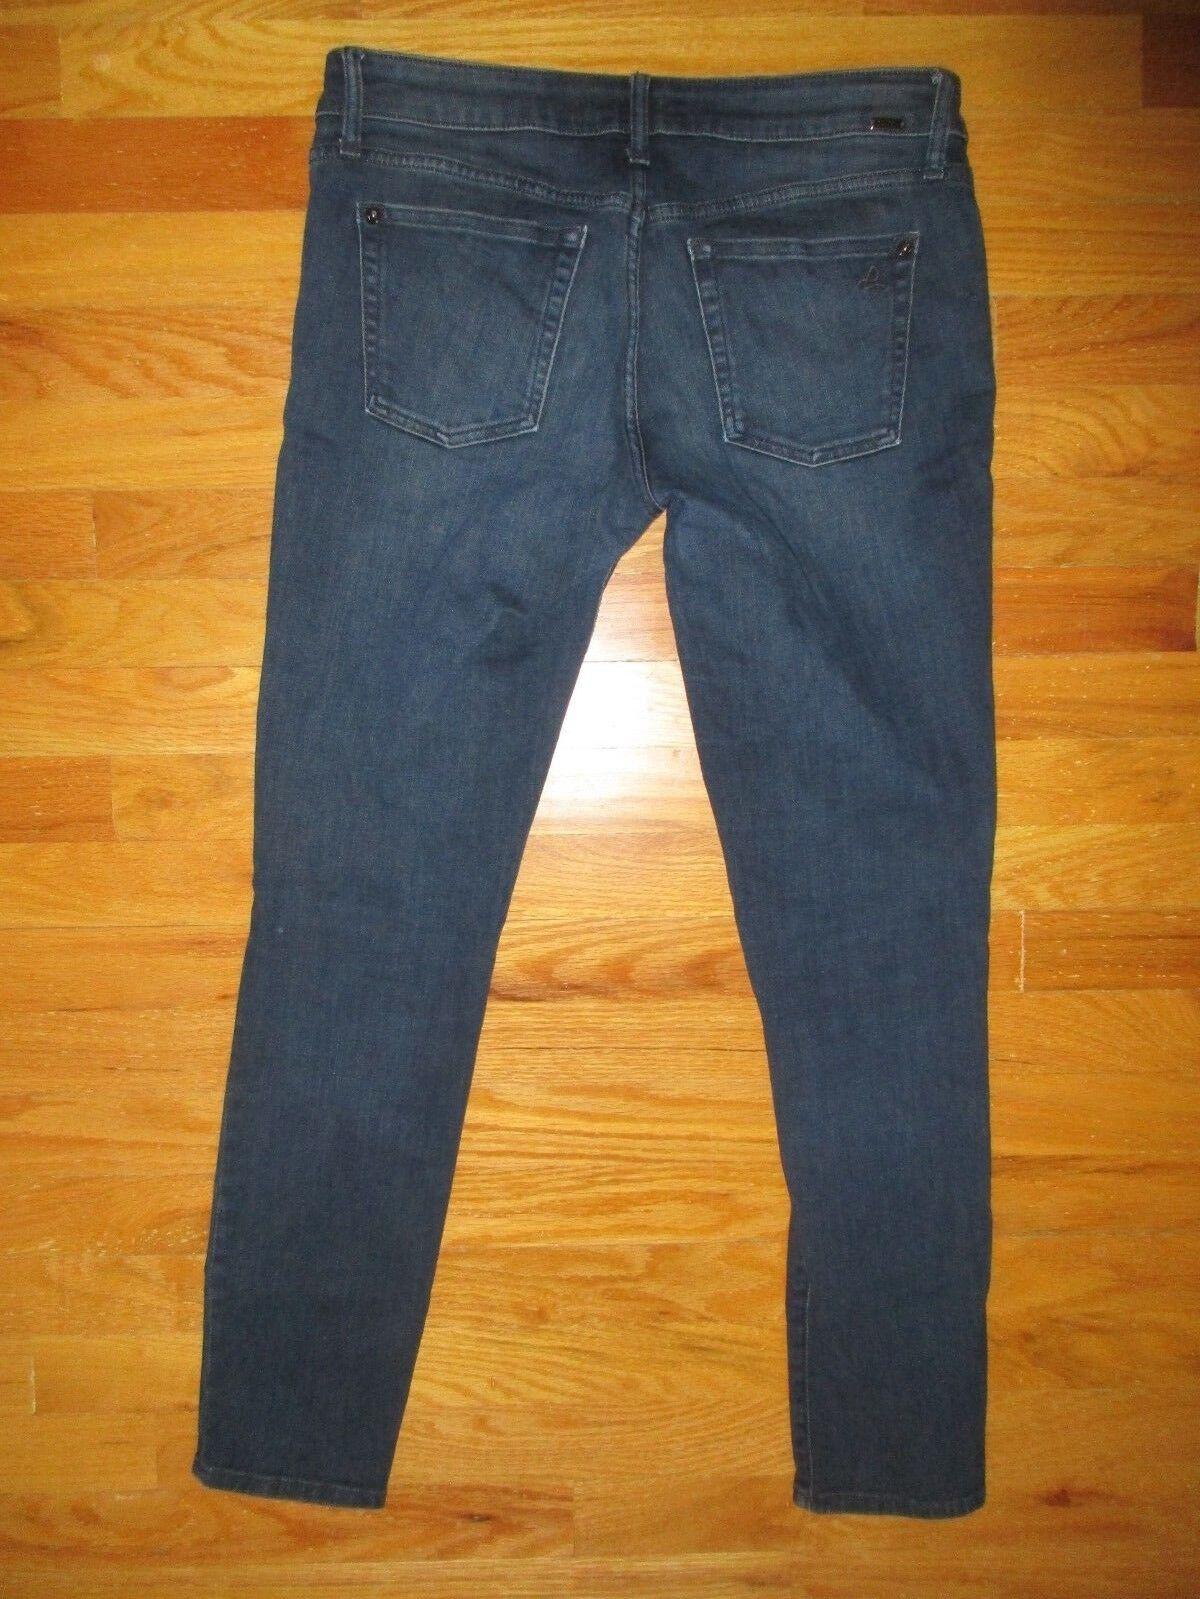 DL1961 Florence Insta Sculpt Tornado Premium Denim Skinny Jeans Size 29